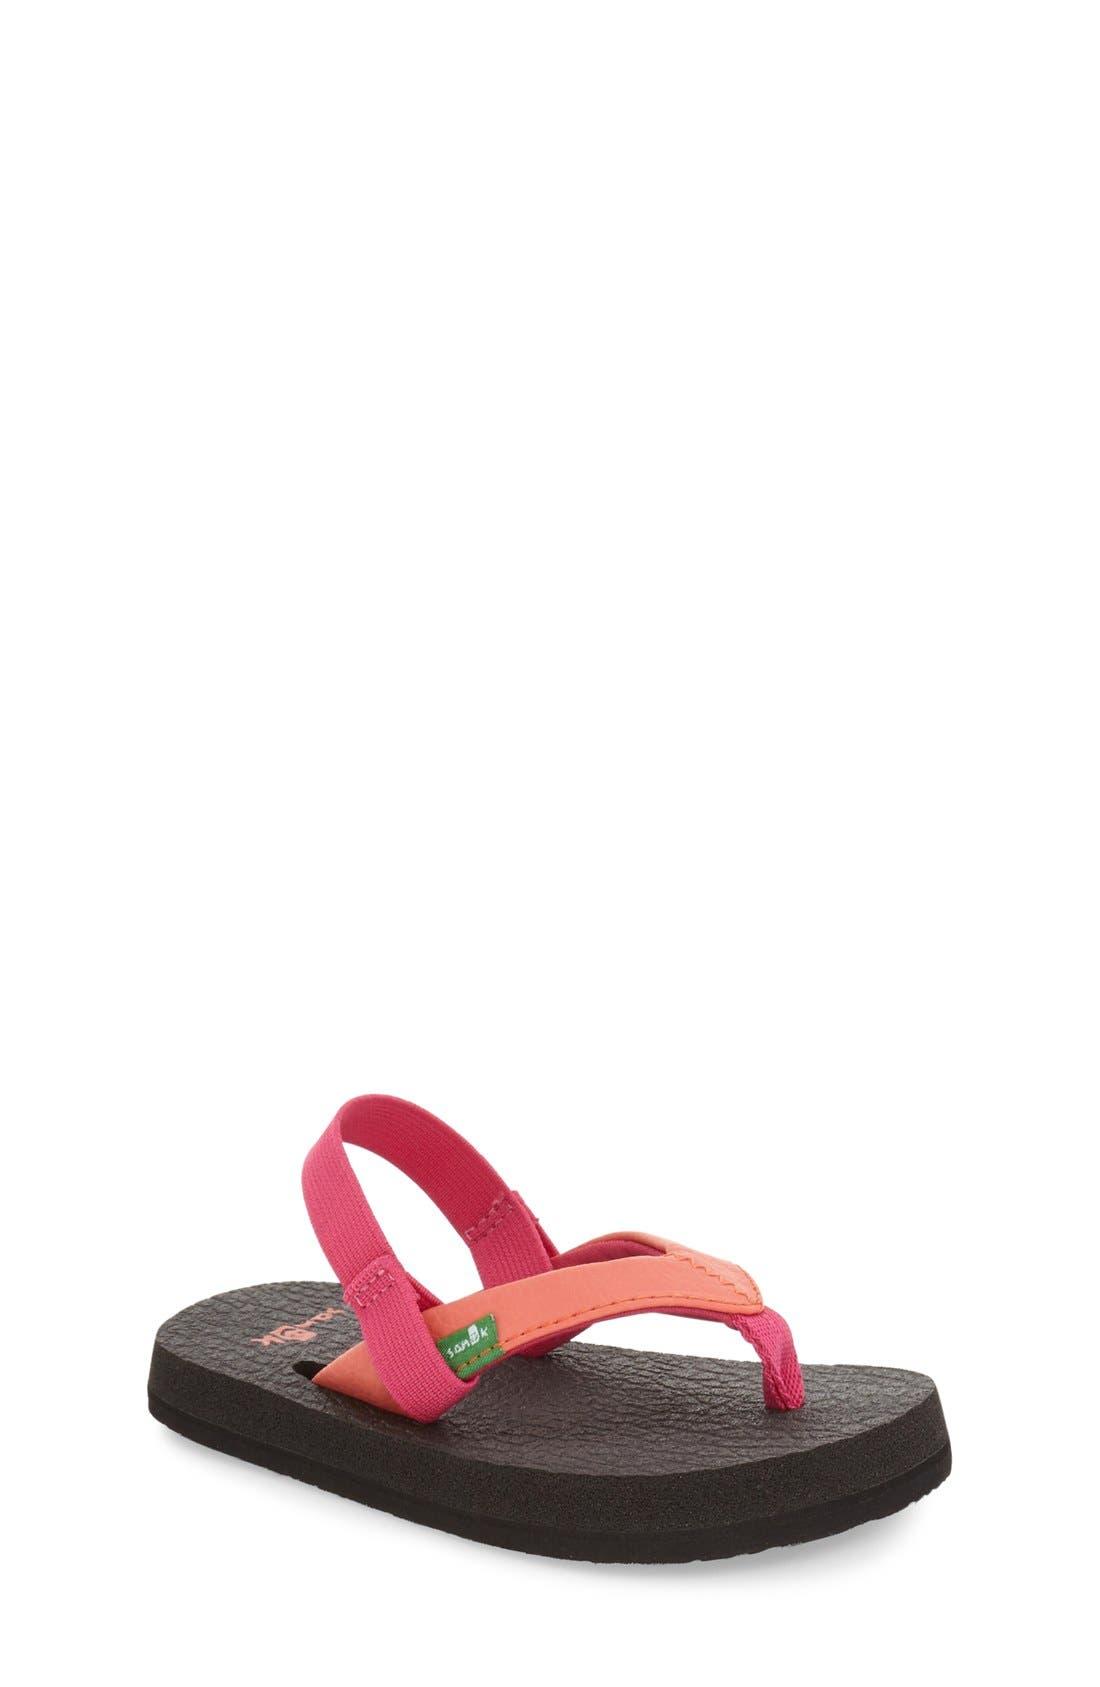 Alternate Image 1 Selected - Sanuk 'Yoga Mat' Sandal (Toddler, Little Kid & Big Kid)